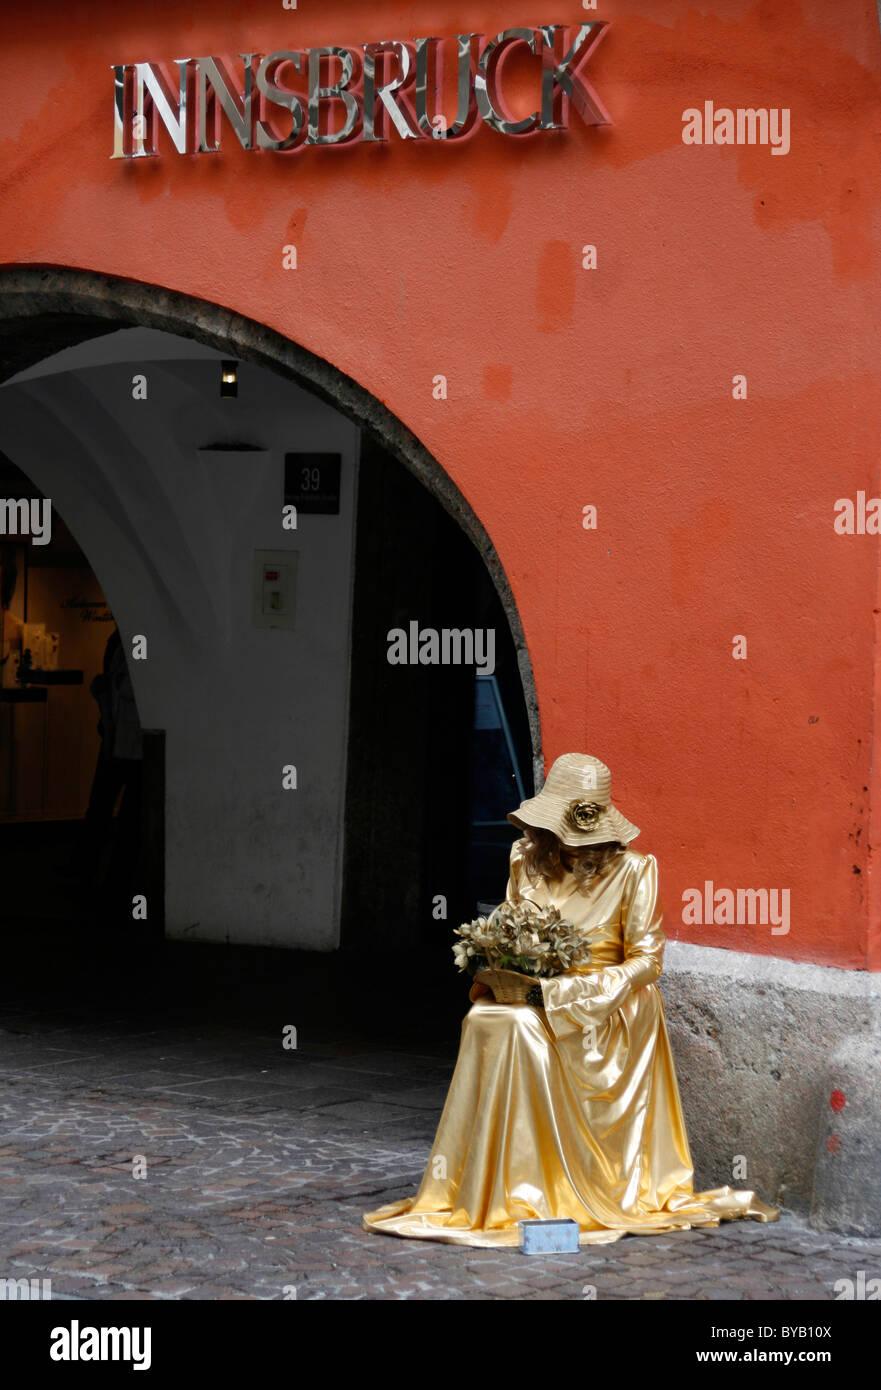 Mime street performer, gold dress, Herzog Friedrich Strasse, historic centre, Innsbruck, Tyrol, Austria, Europe - Stock Image